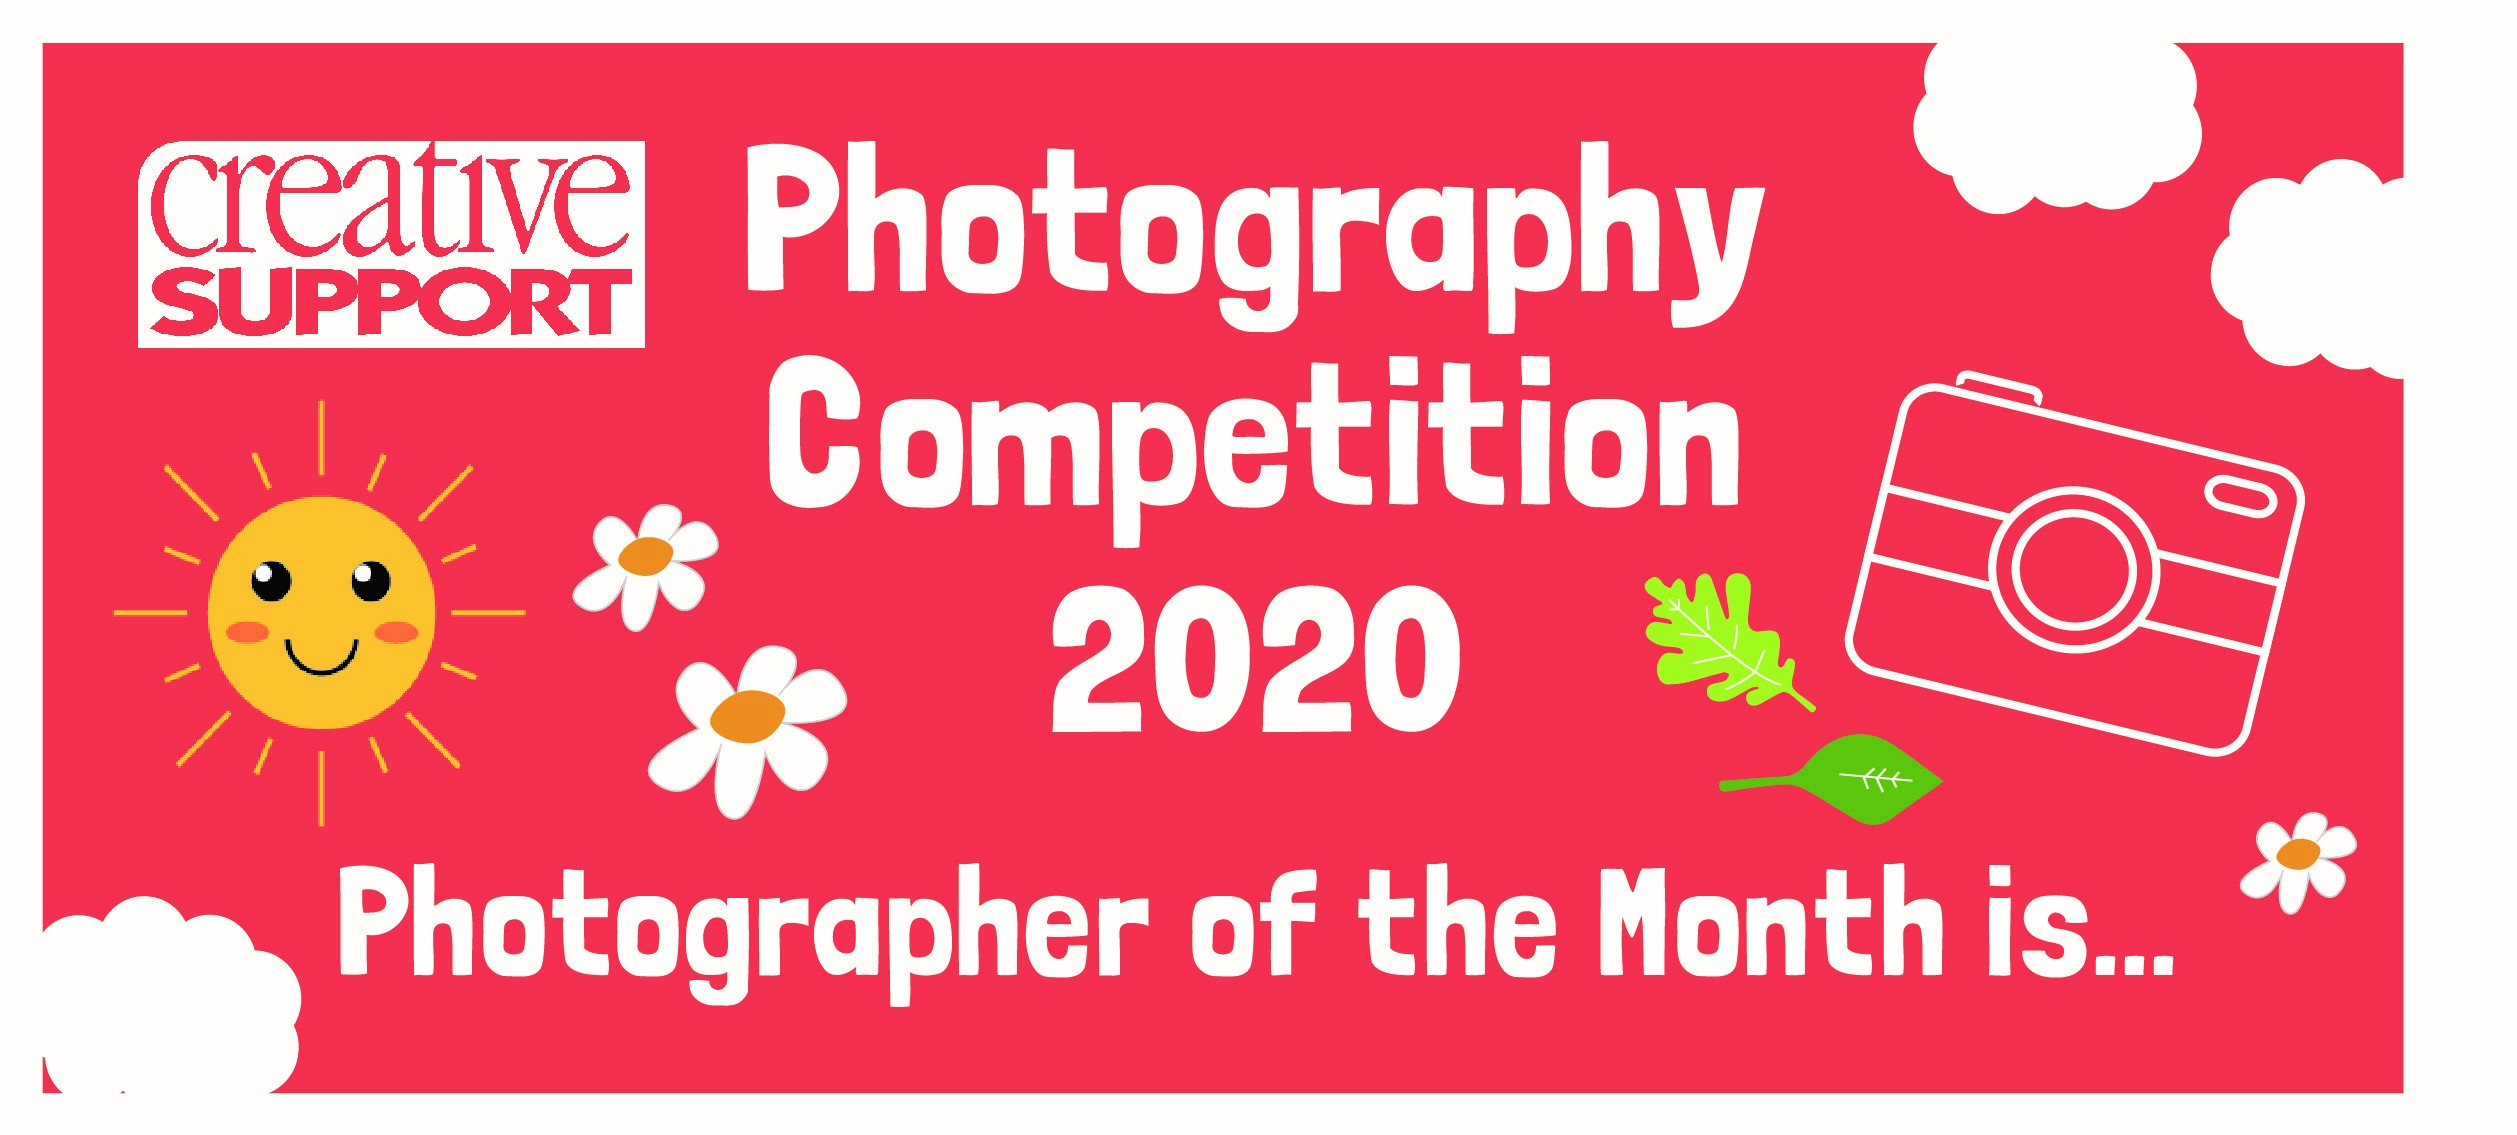 Photography Competiiton 2020